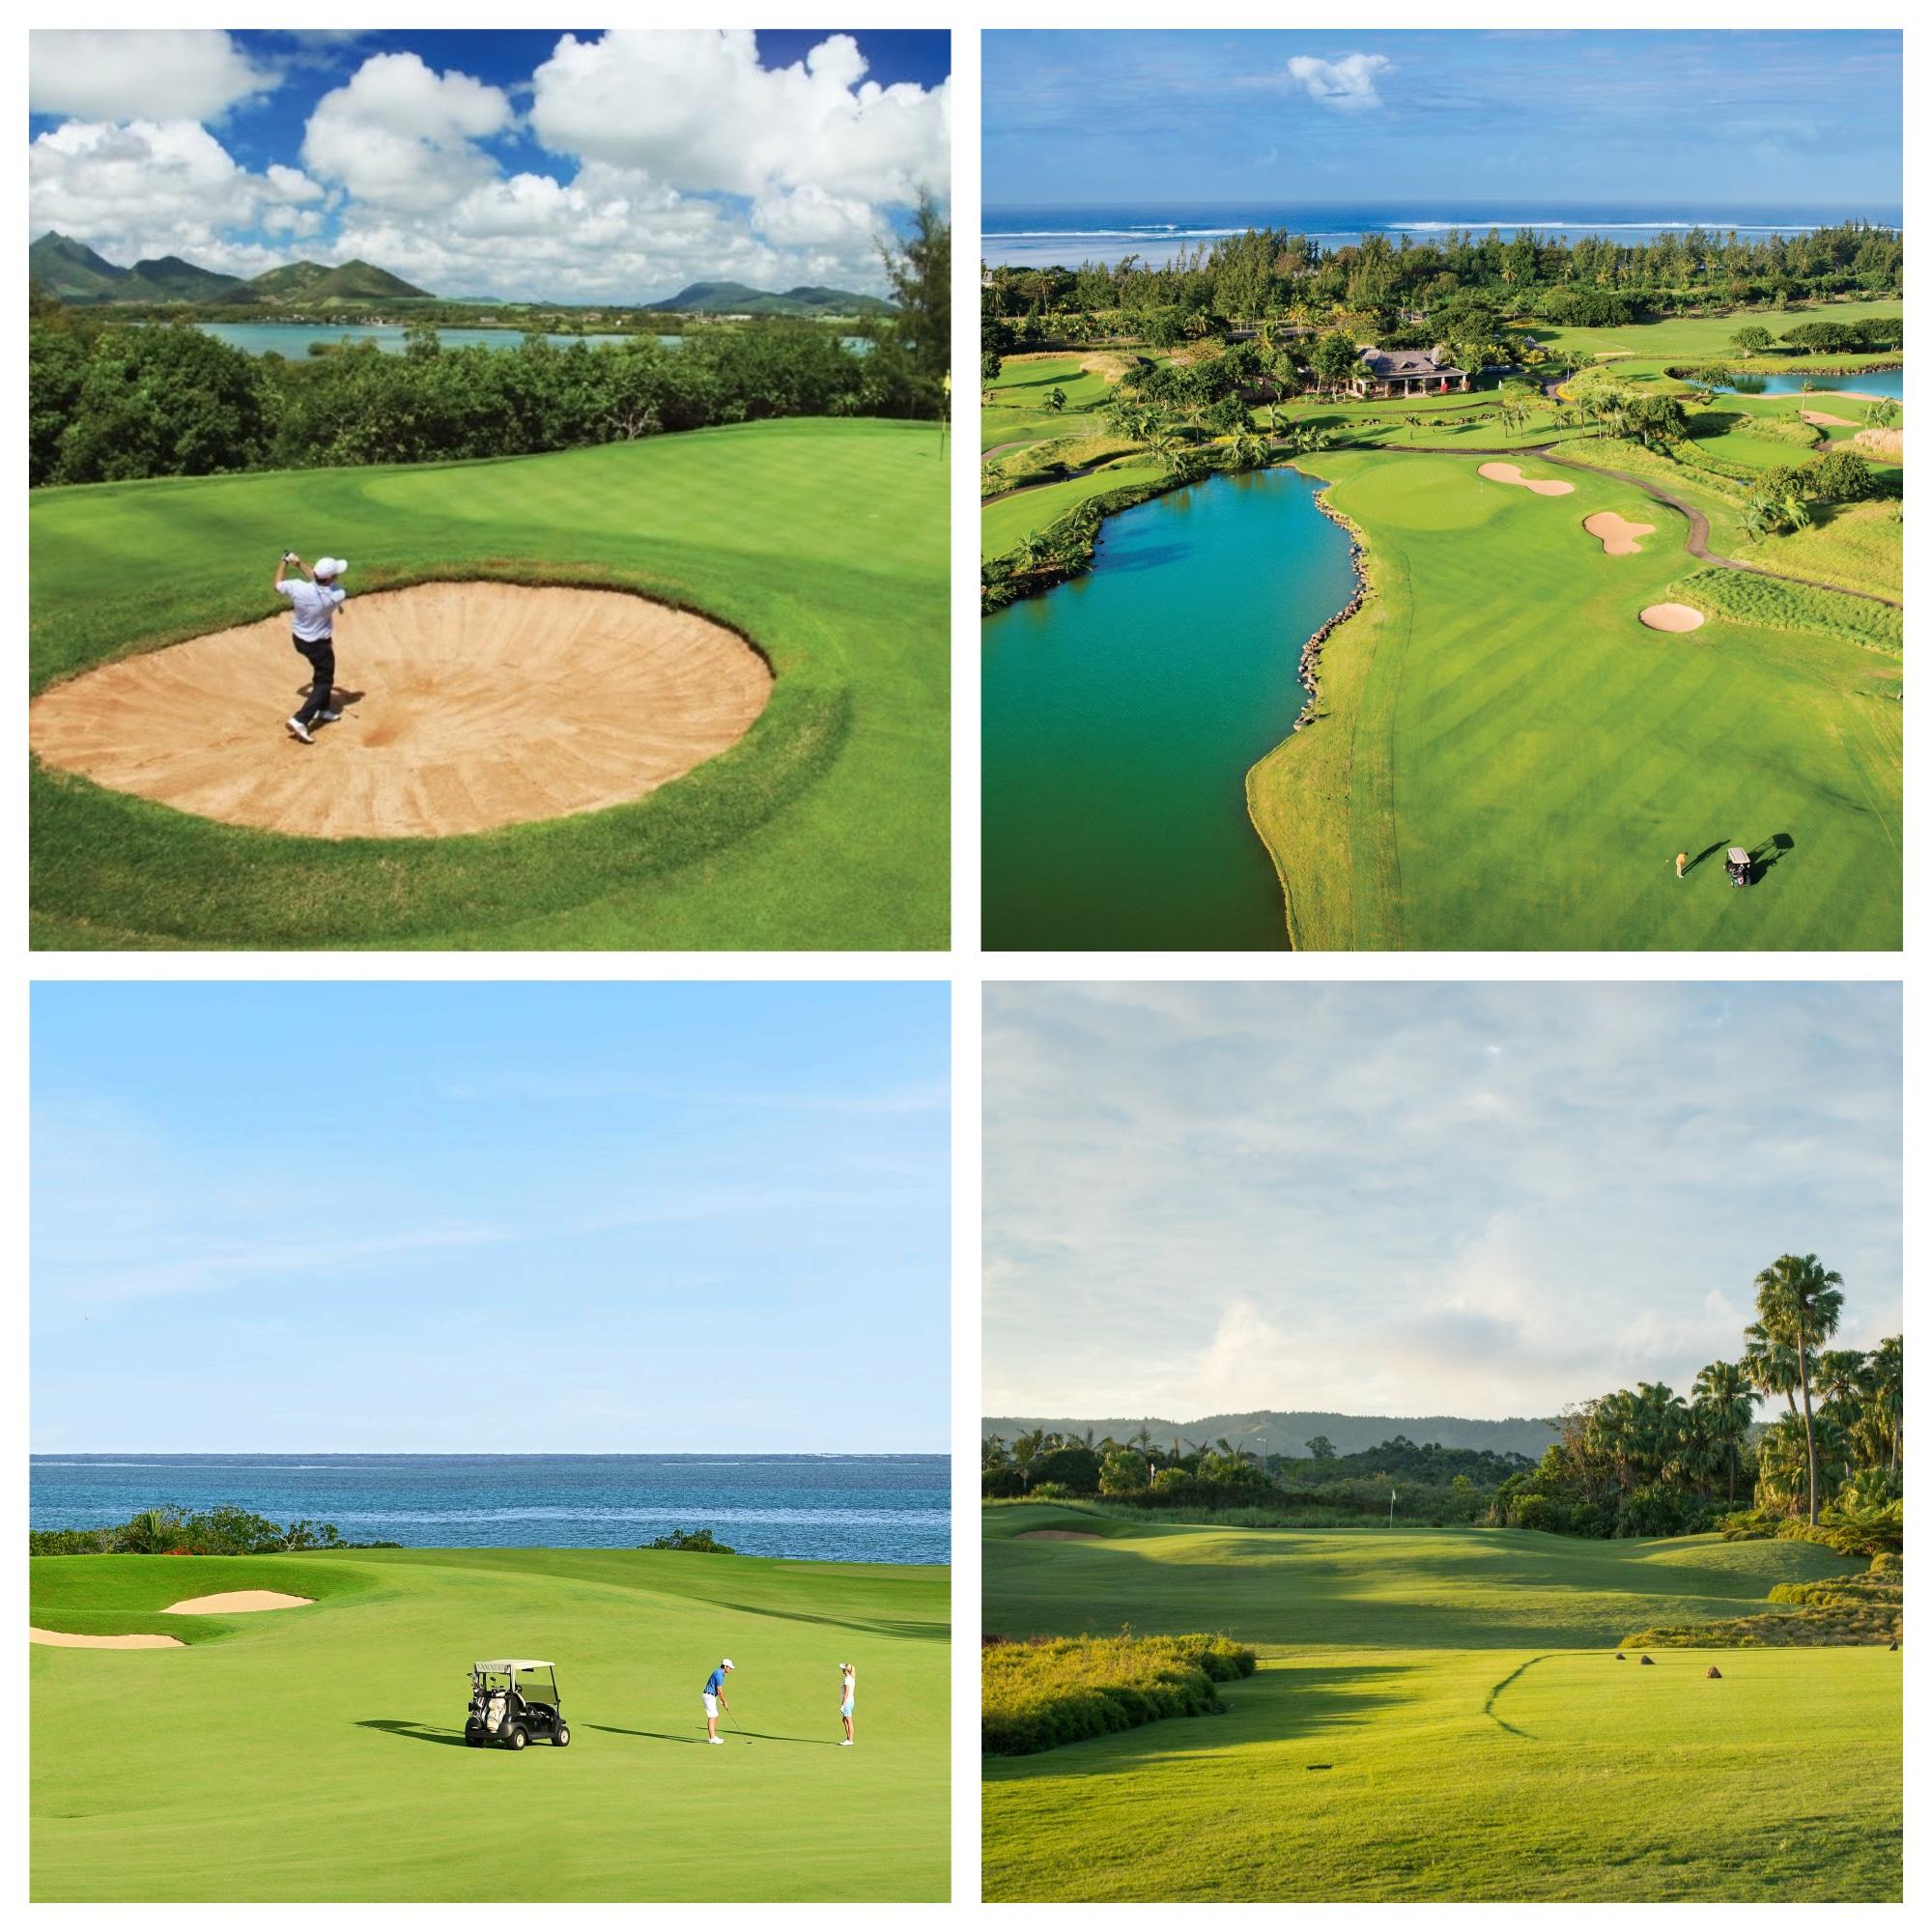 Ile aux Cerfs, Anahita, Heritage and Avalon Golf Clubs